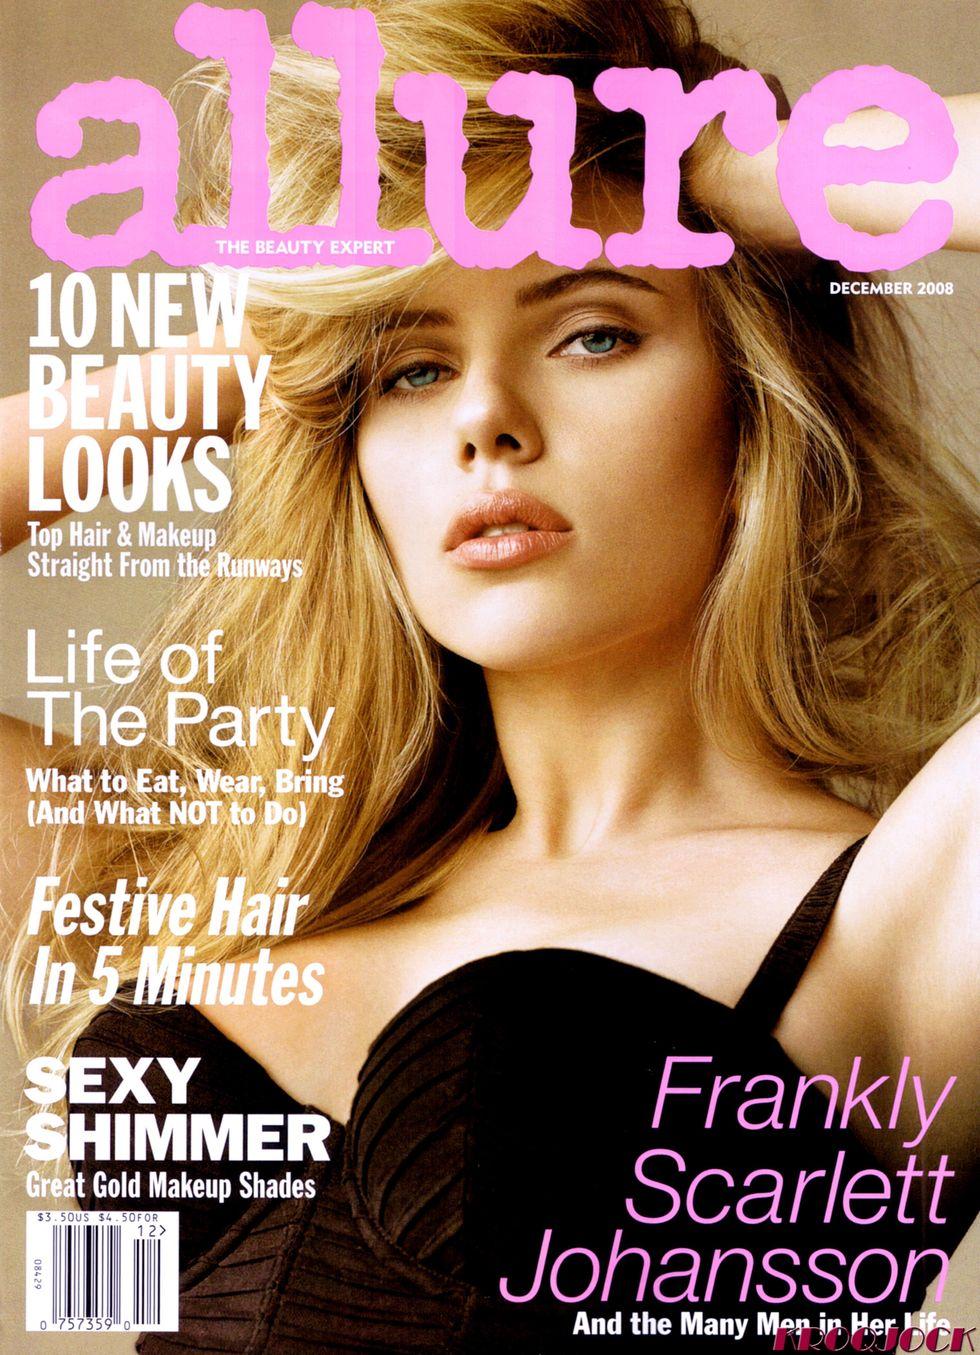 scarlett-johansson-allure-magazine-december-2008-01